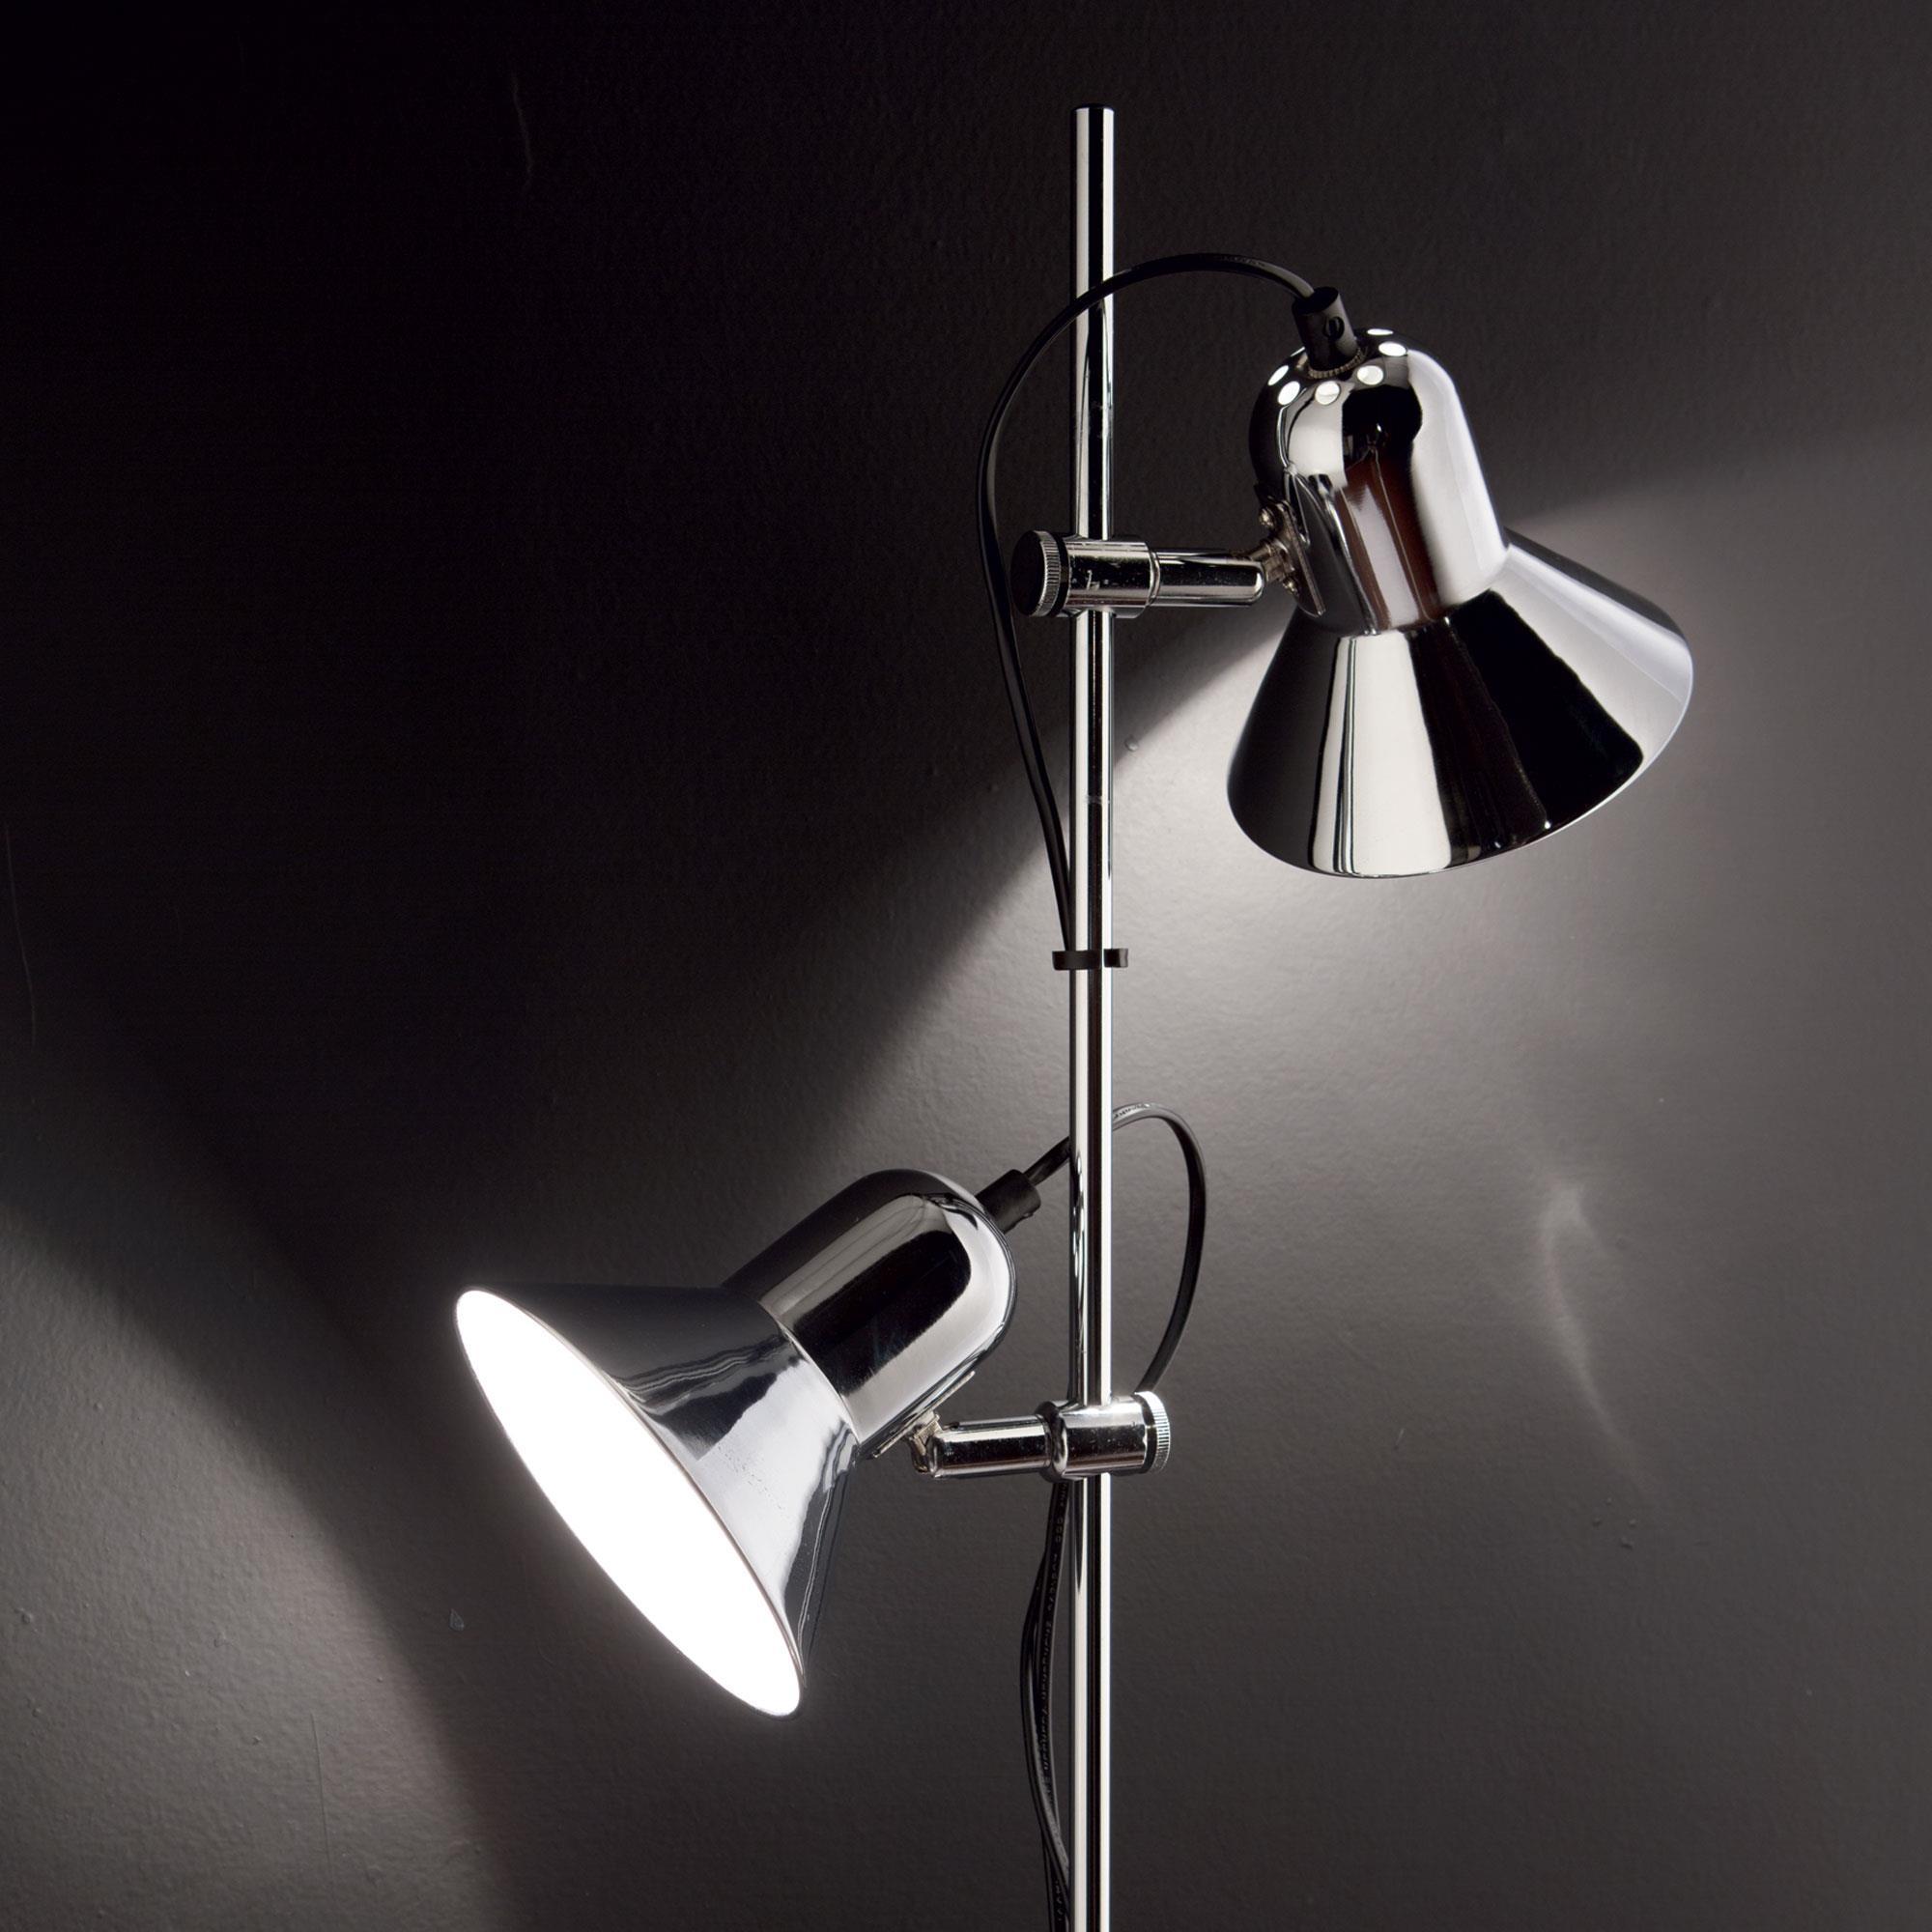 Ideal Lux 061122 Polly PT2 Cromo olvasó állólámpa